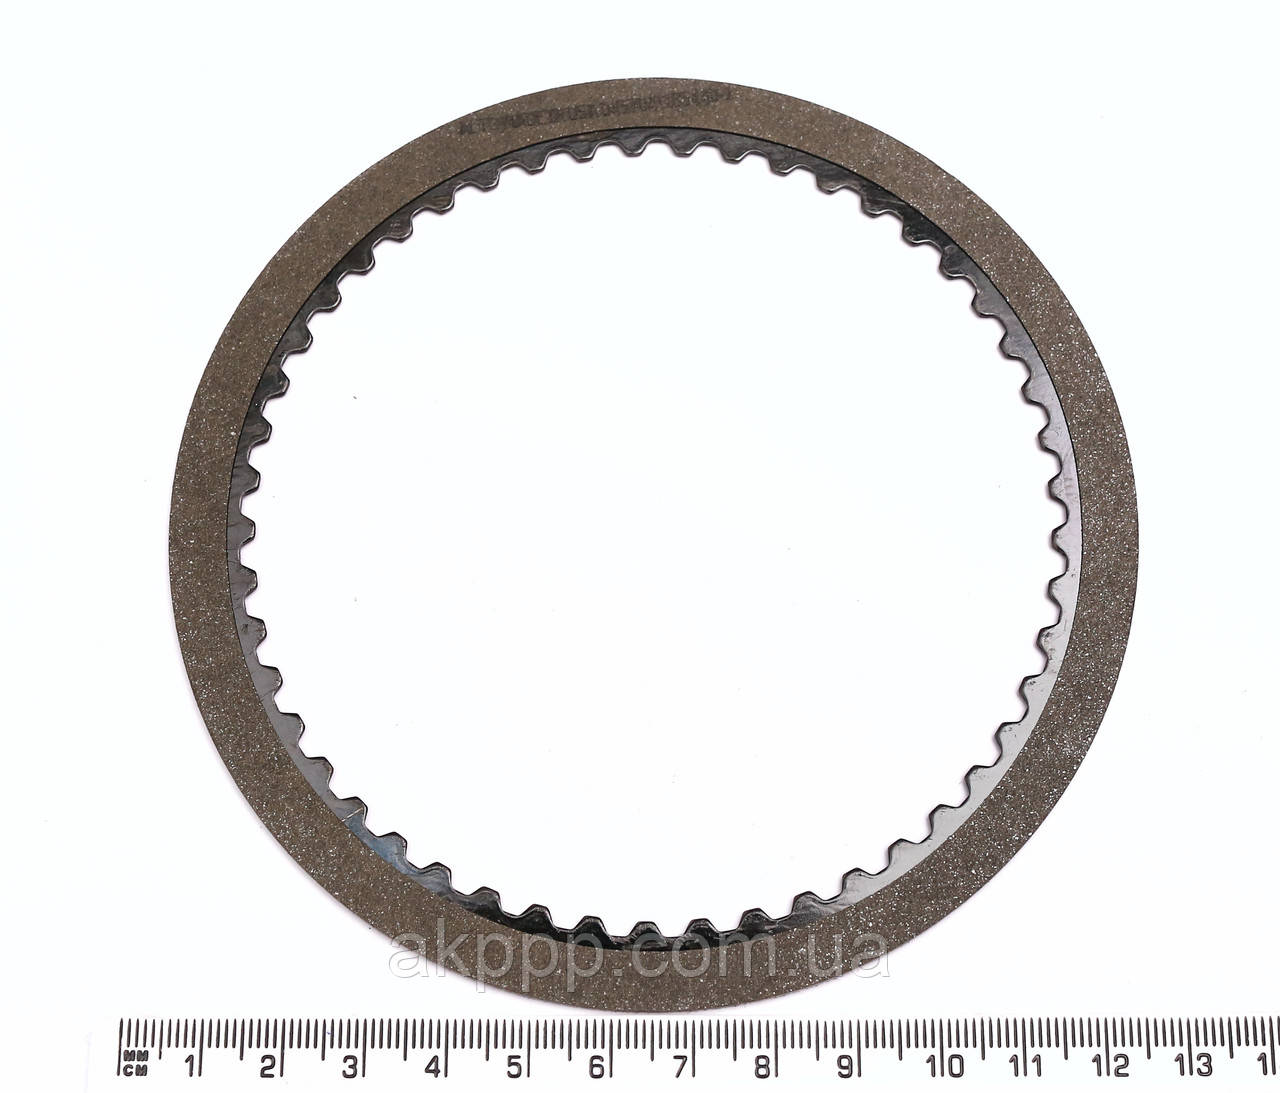 Фрикціон диск зчеплення акпп A404, A413, A470, A670